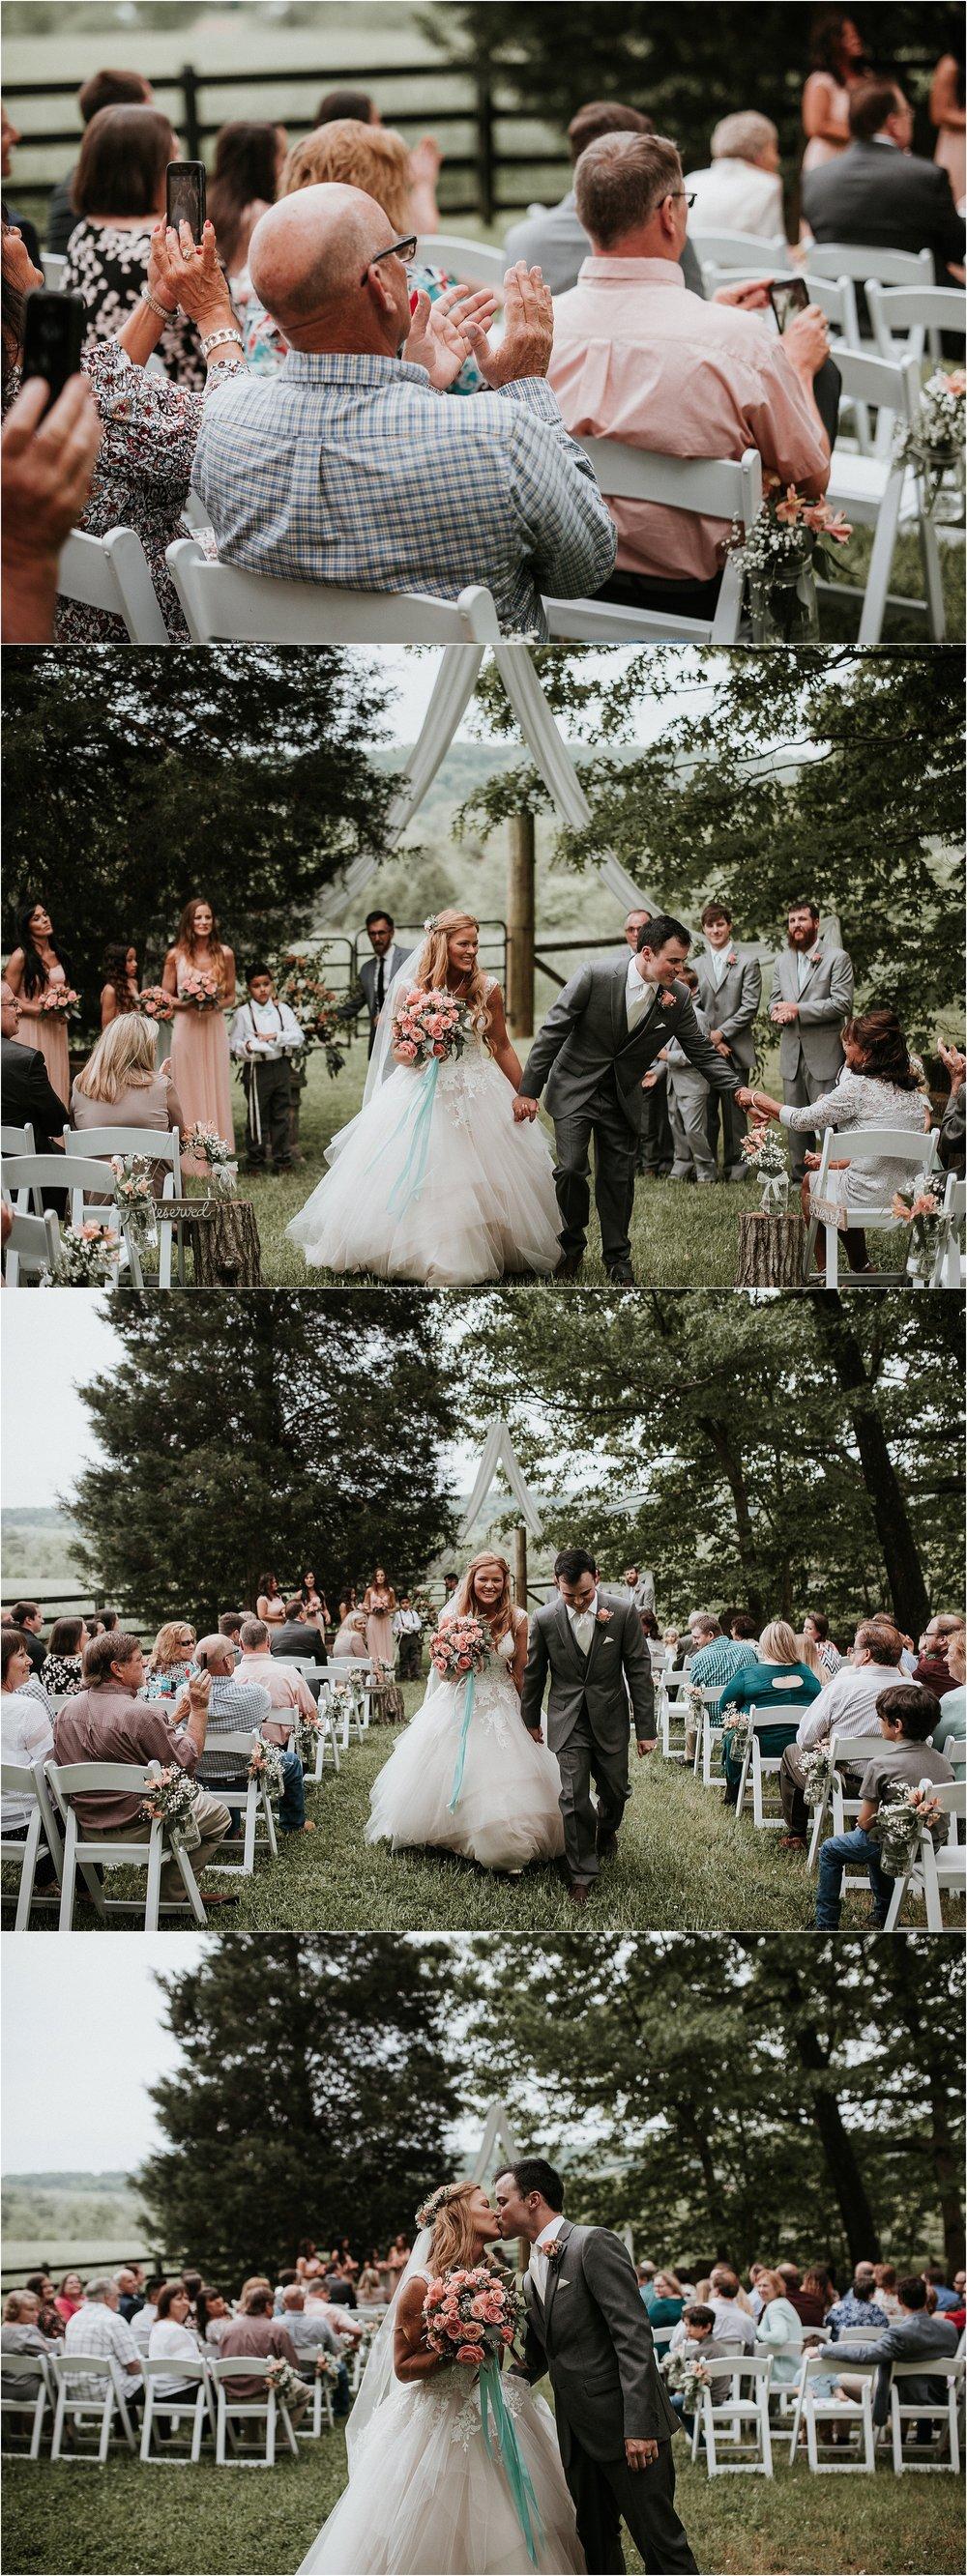 Carolina-Country-Weddings-Mount-Pleasant-nc-107.jpg